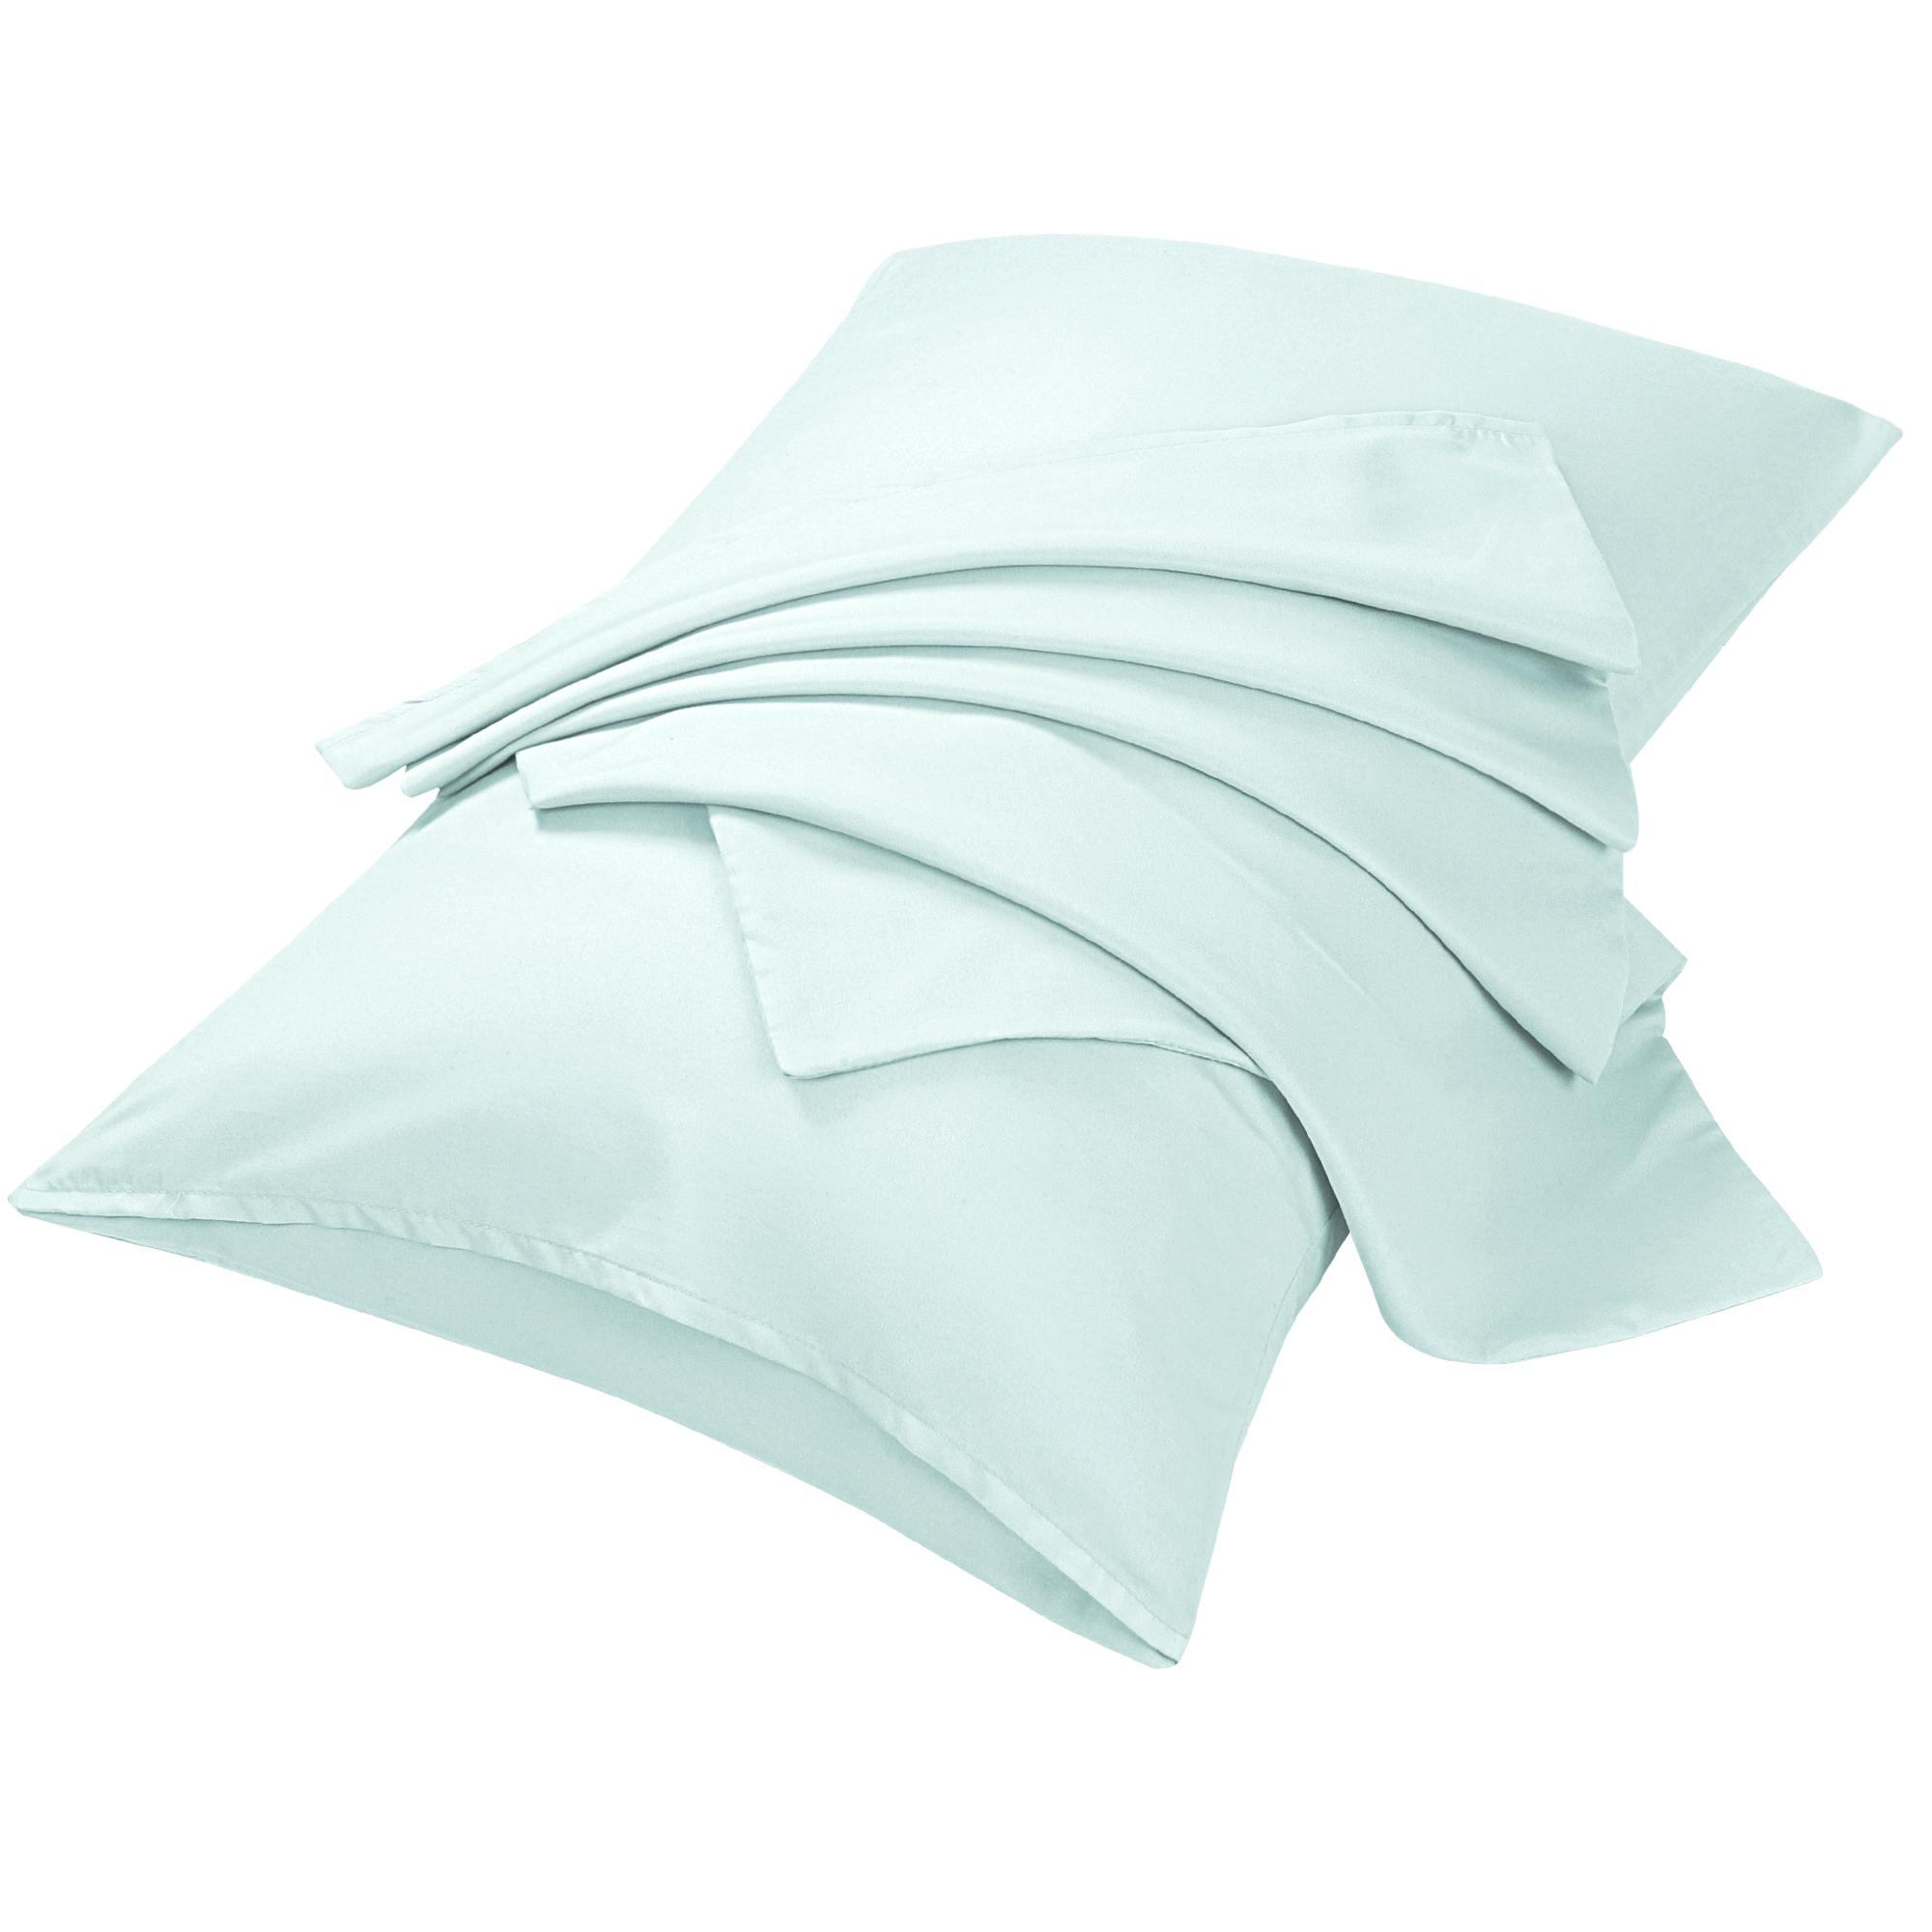 "2pcs Pillowcases Soft Microfiber, No Wrinkle, Light Gray Queen (20"" x 30"")"